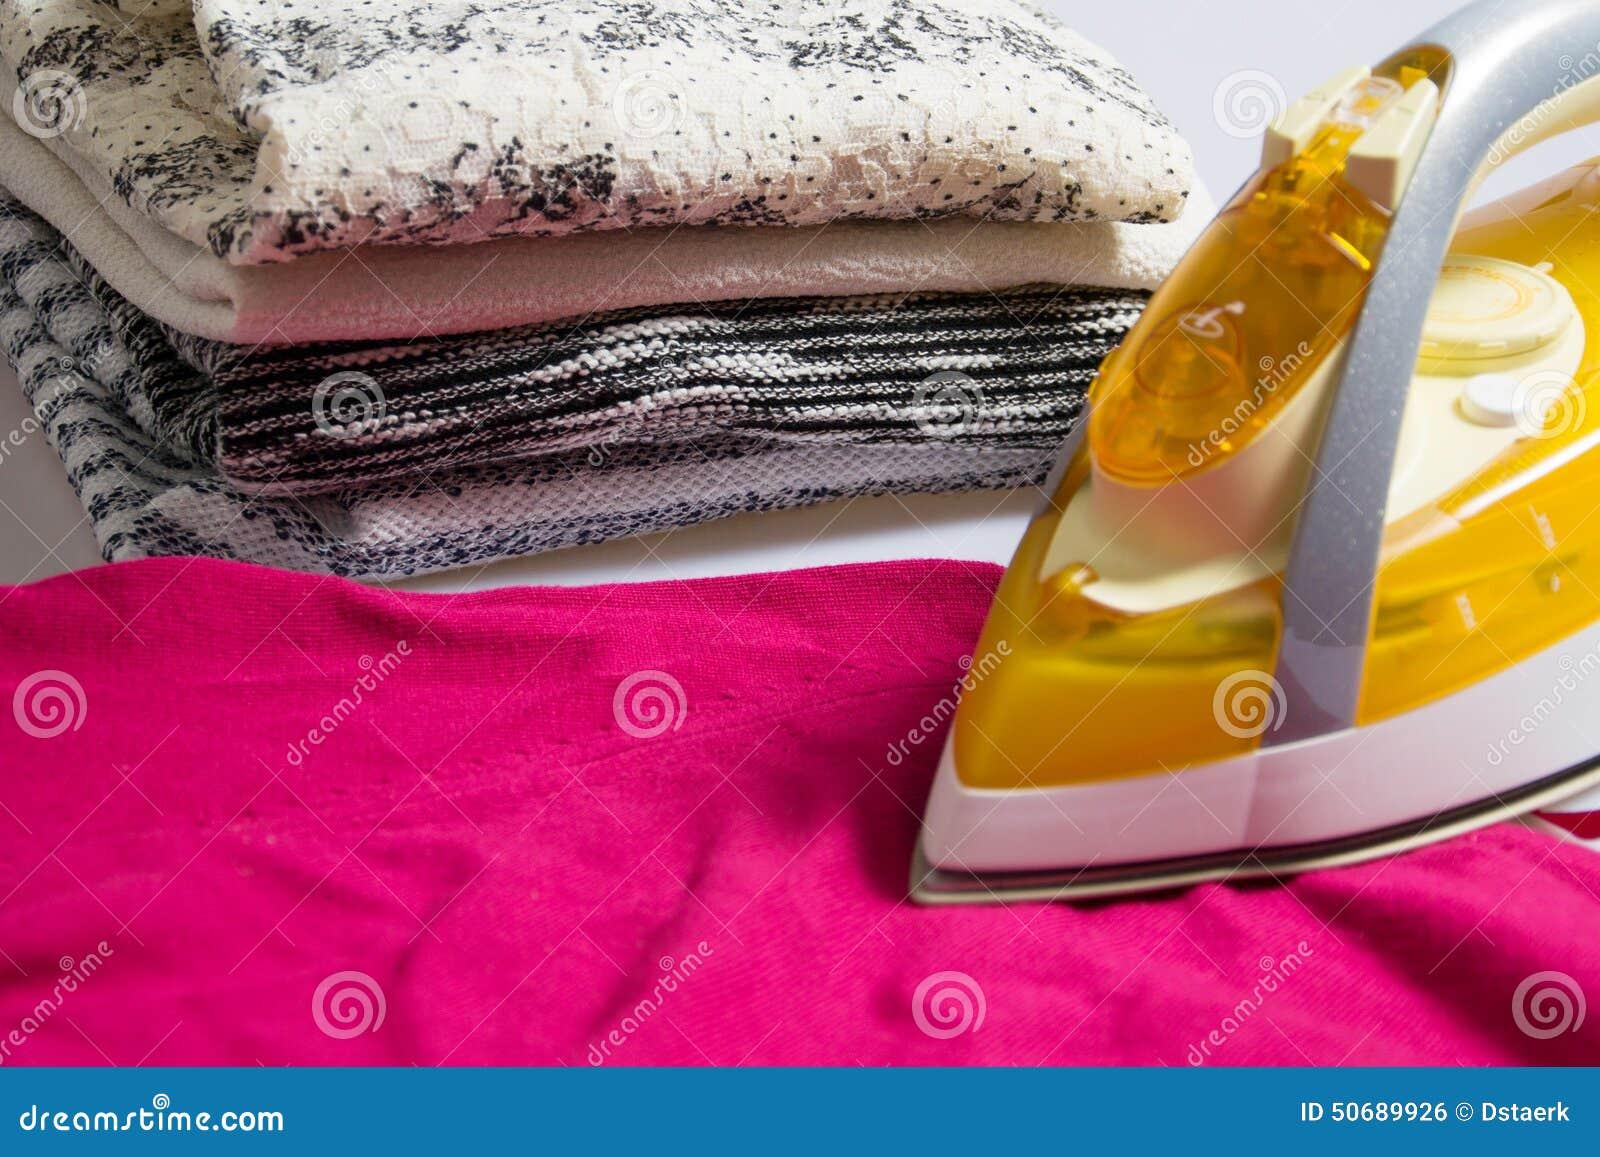 Download 电烙 库存照片. 图片 包括有 家事, 国内, 衣物, 五颜六色, 工作, 干净, 电烙, 空白, 布料 - 50689926